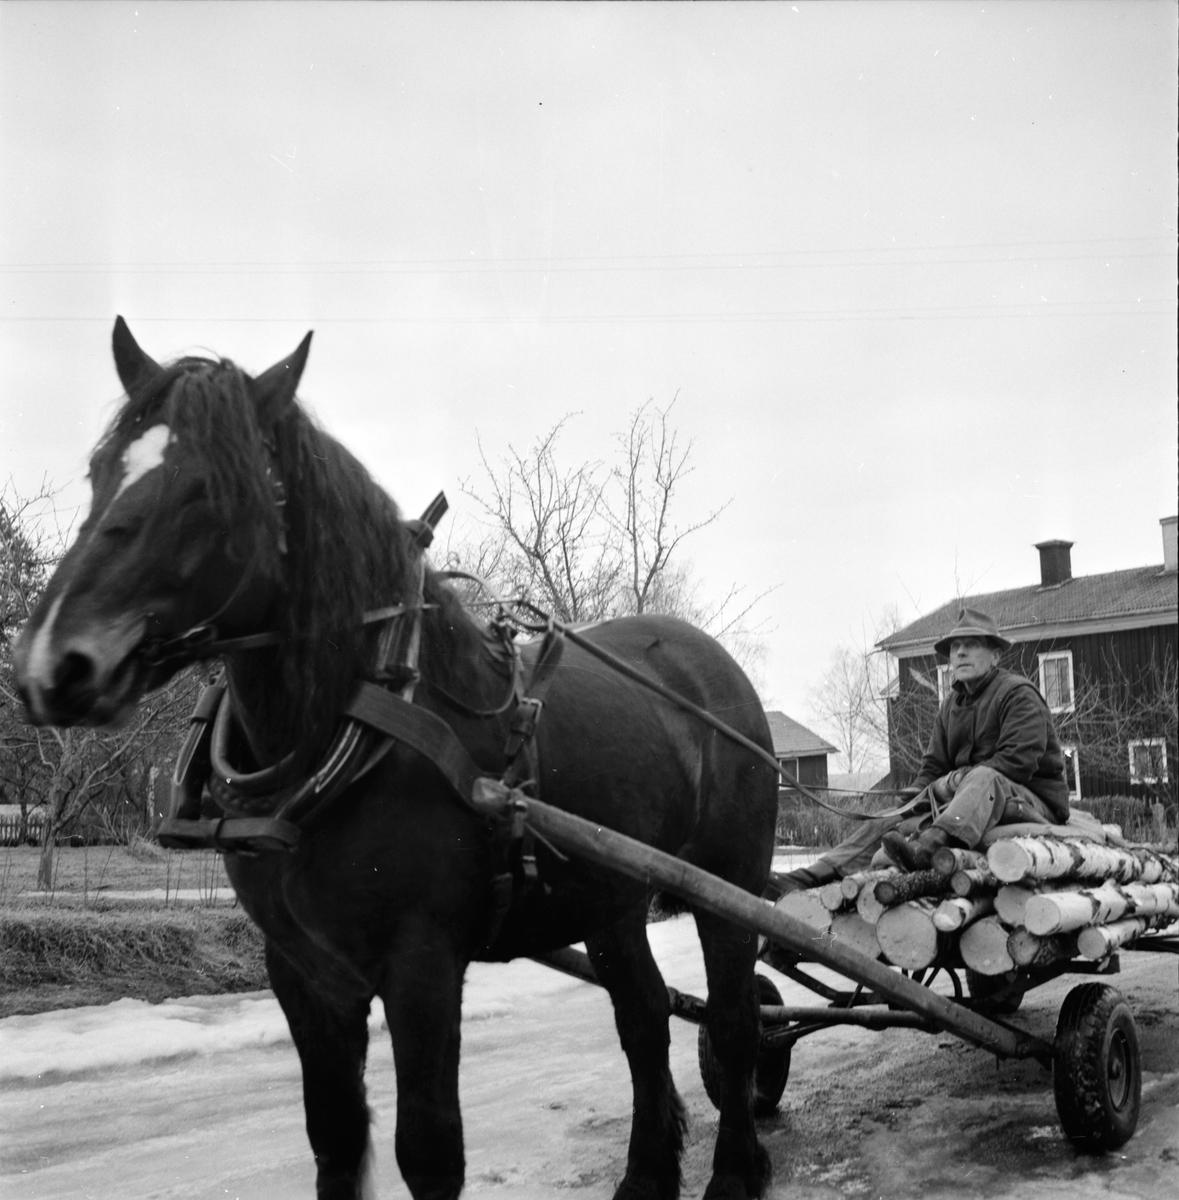 Söderala, Svante Häger o Erik Lindberg, 3 April 1964